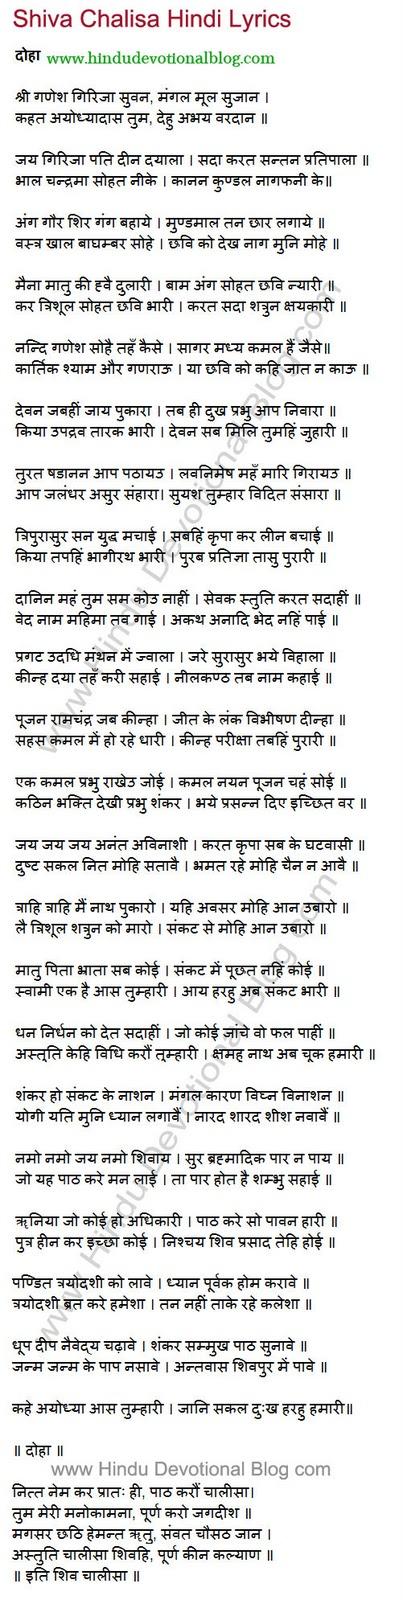 Shiv Chalisa Lyrics in Hindi & English (with Meaning ...